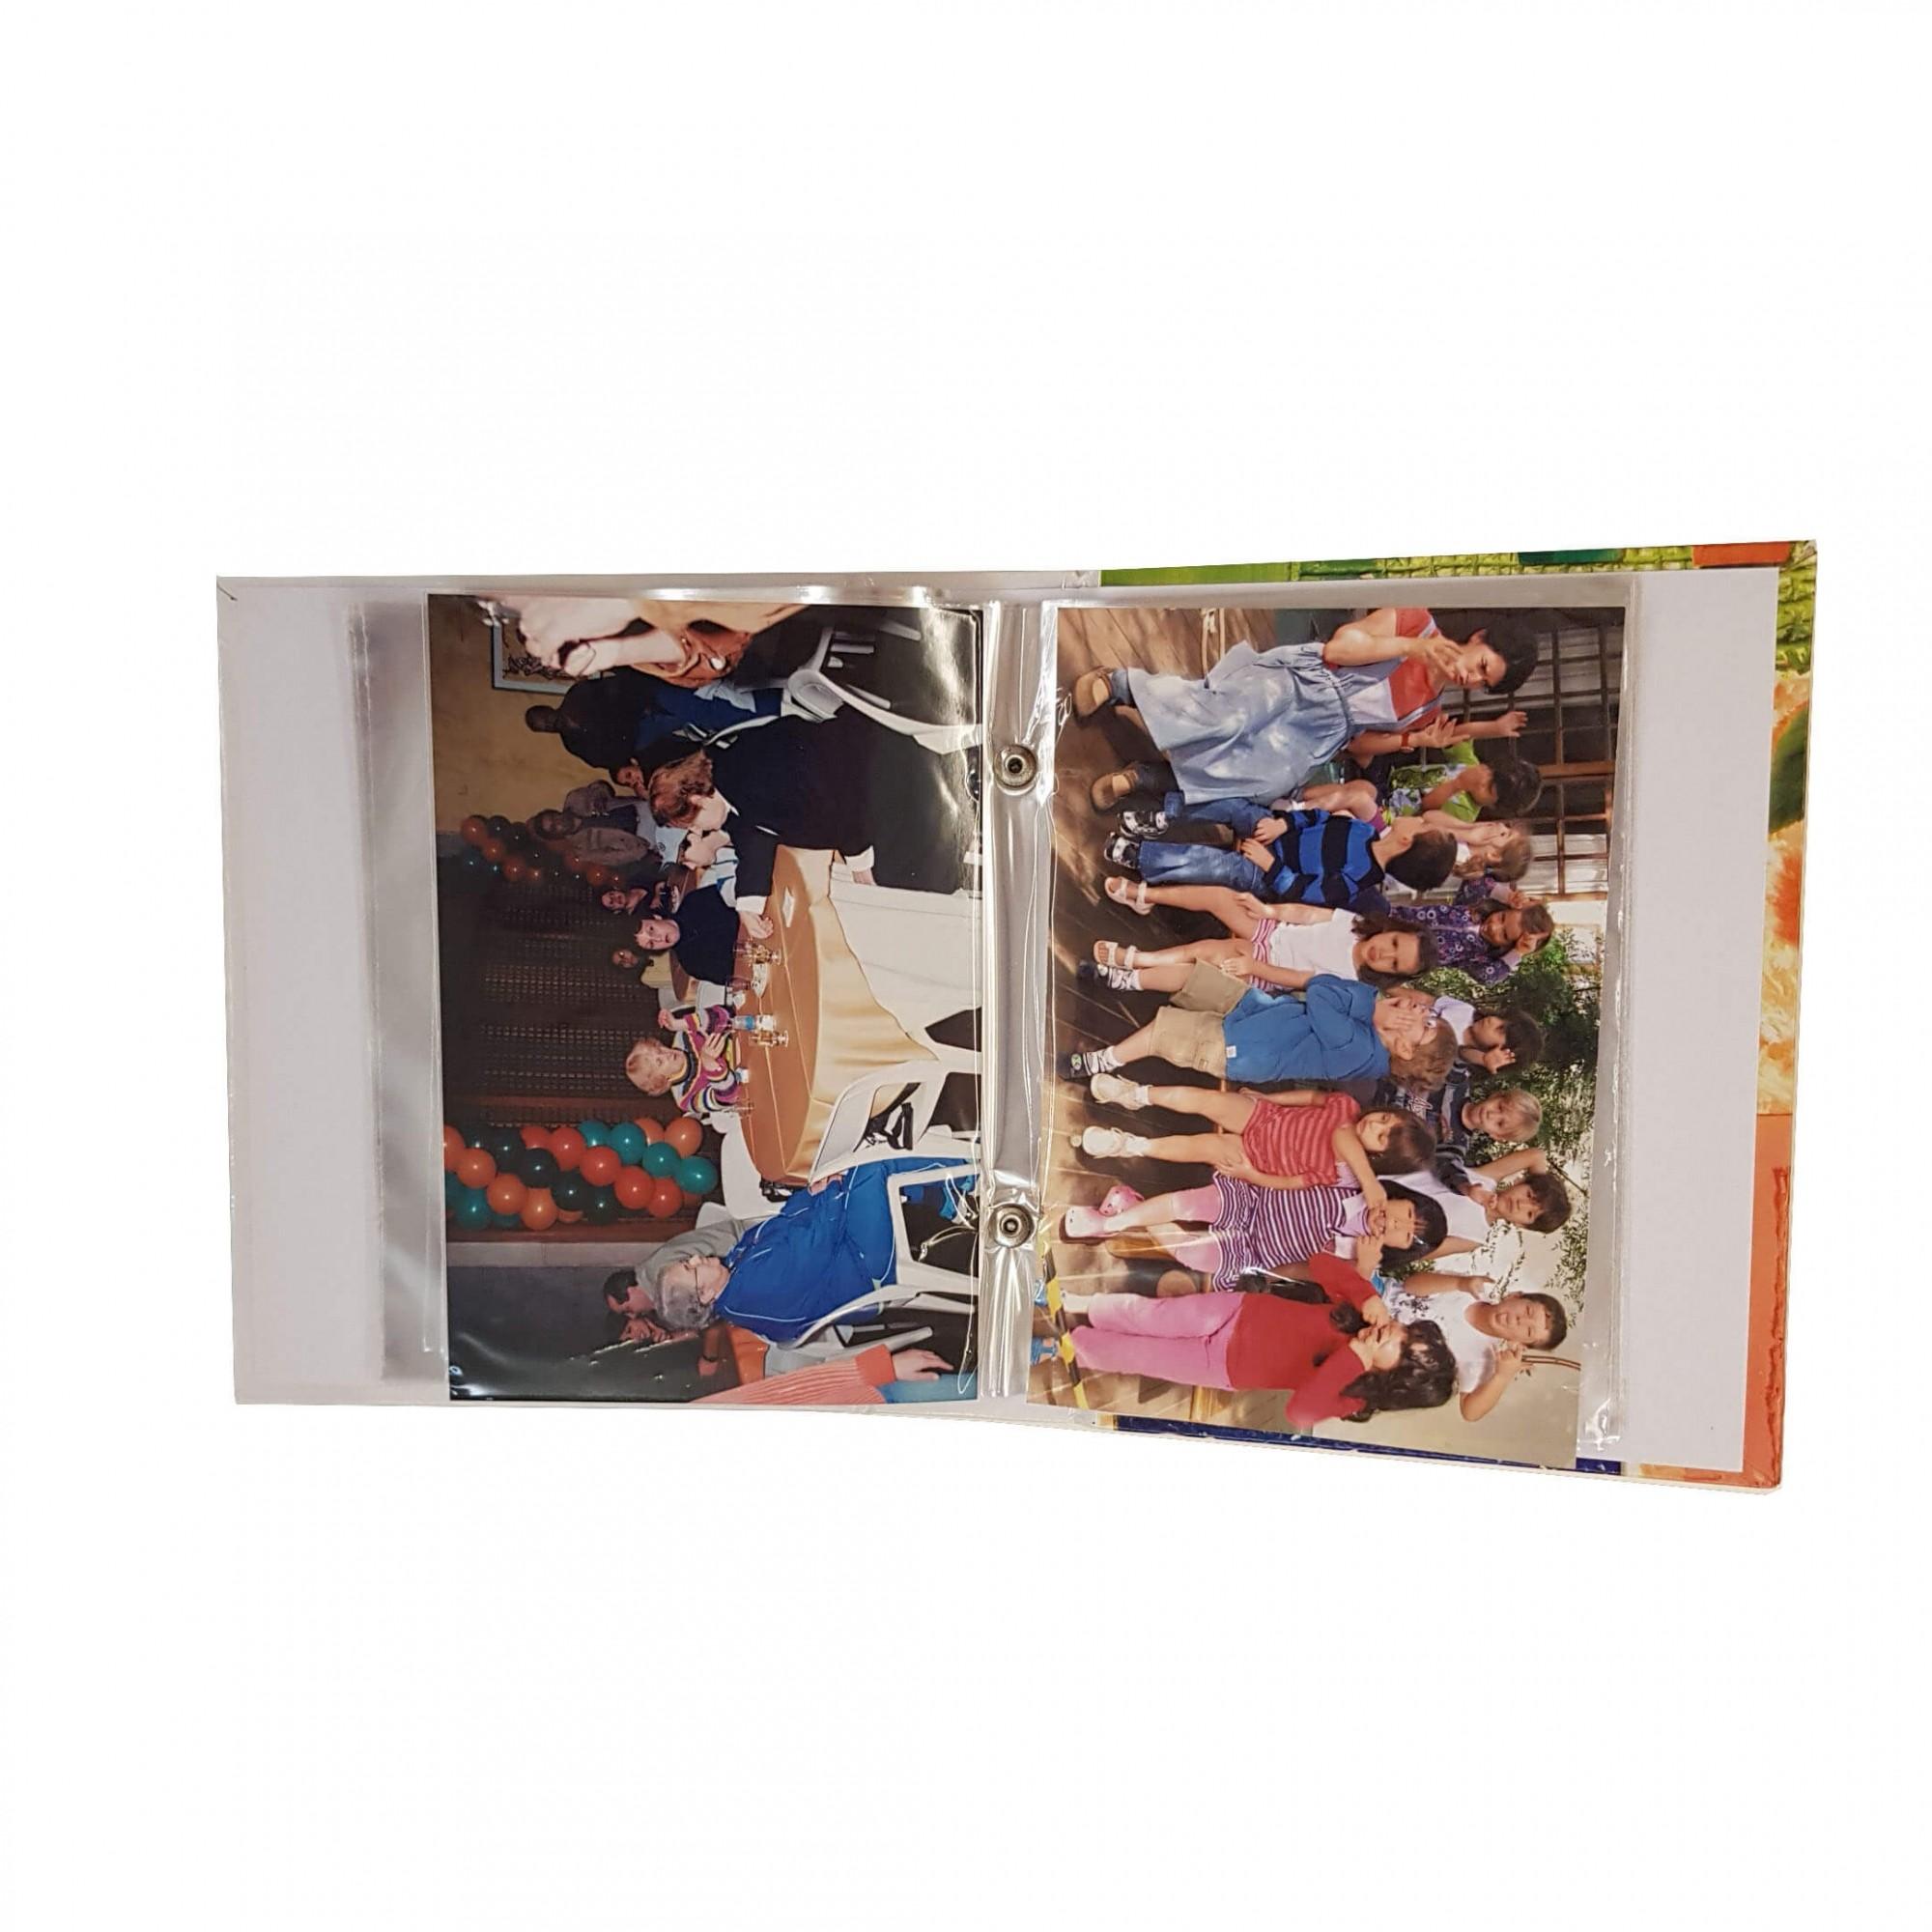 Albuns Para 1200 Fotos 10x15 Coraçao 10 Unid